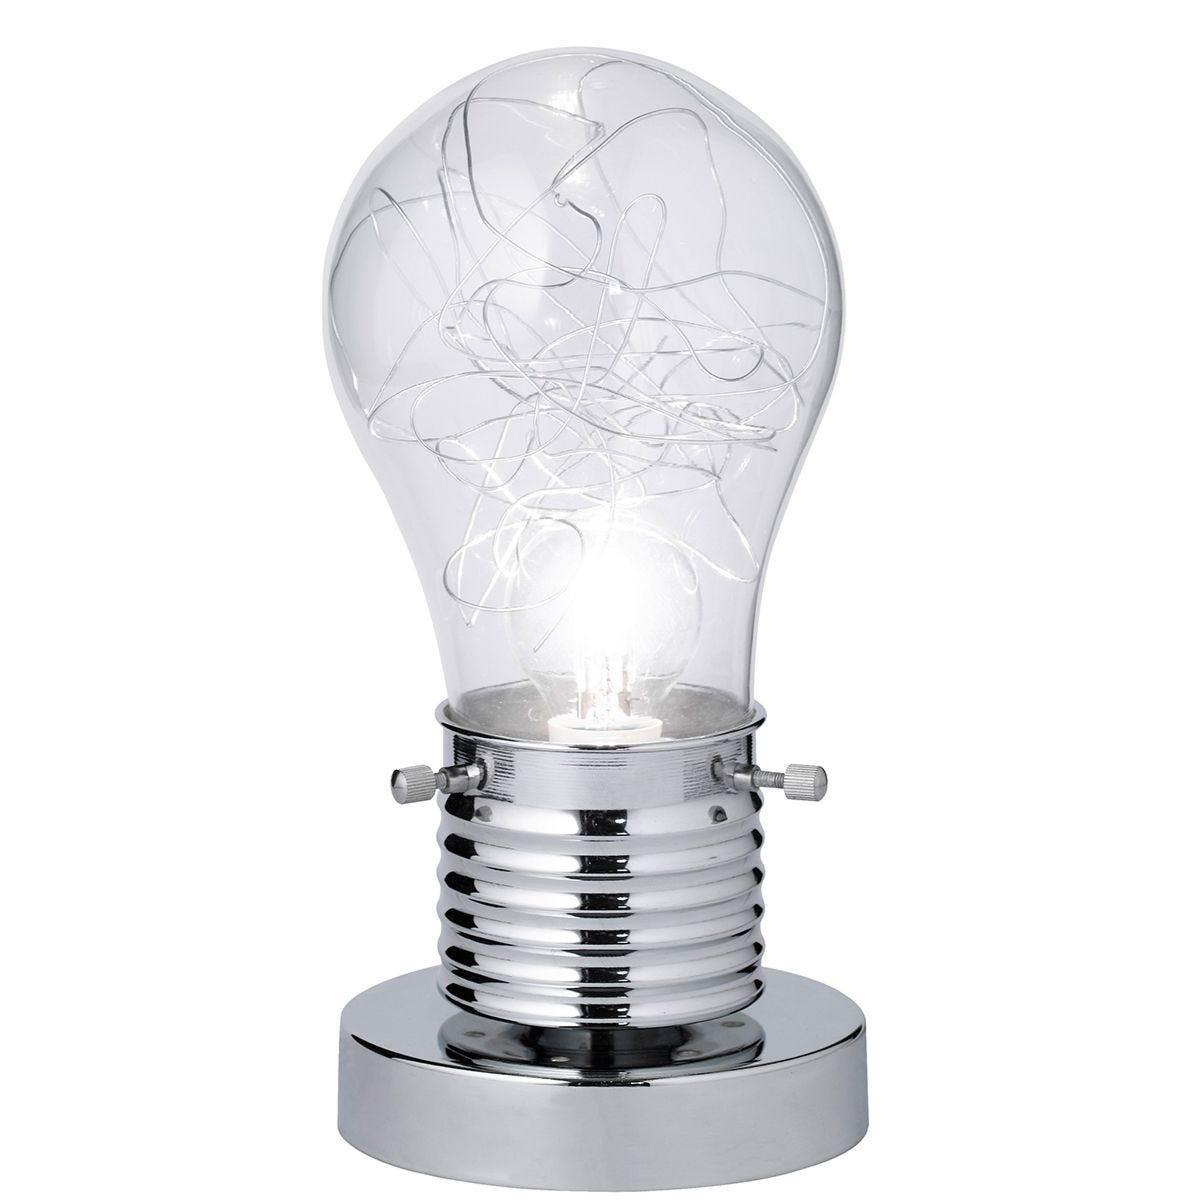 Action Futura Table Lamp - Chrome